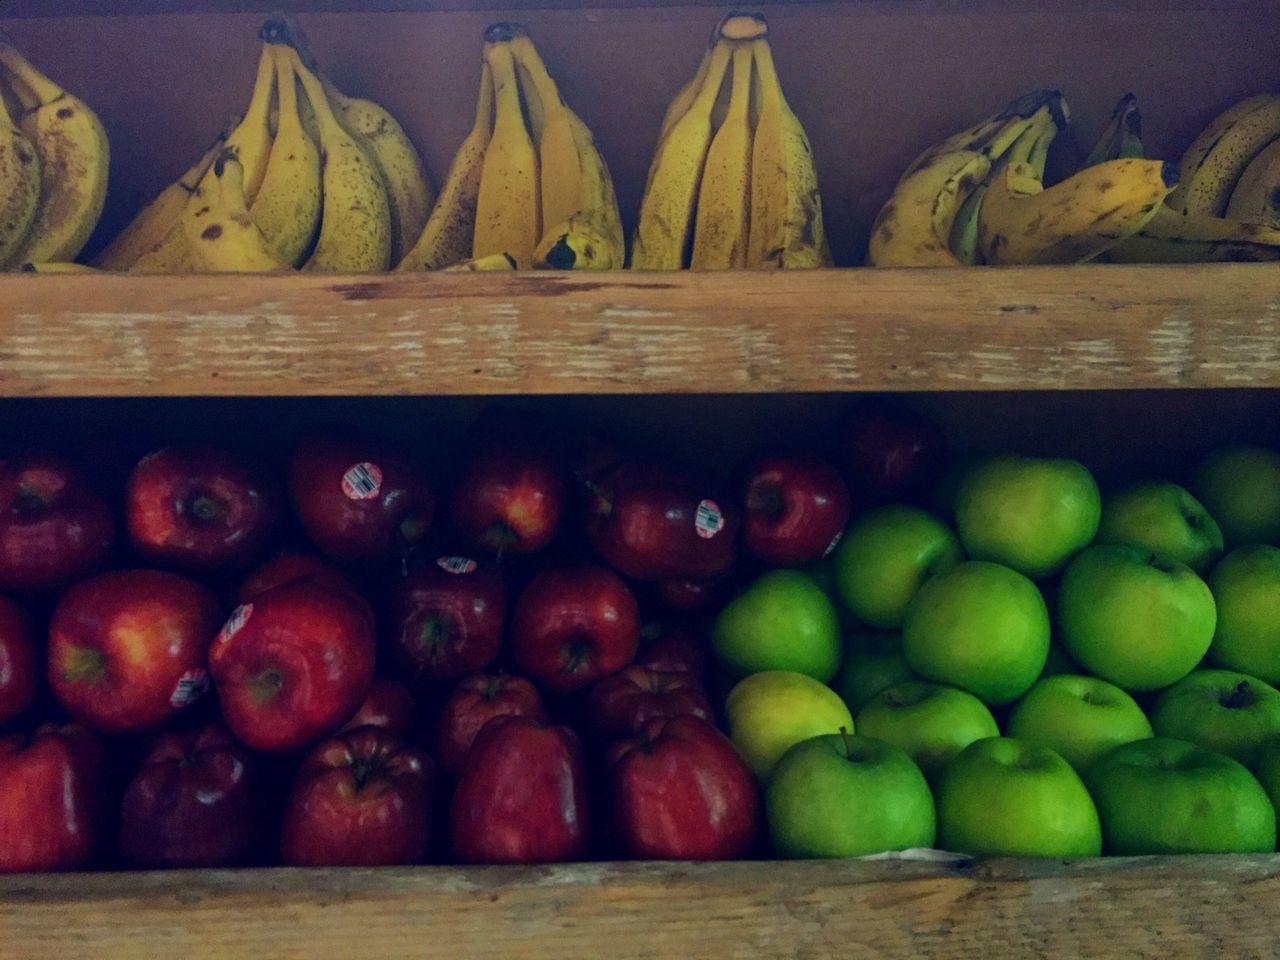 Healthy Eating Arrangement Food Banana Apples